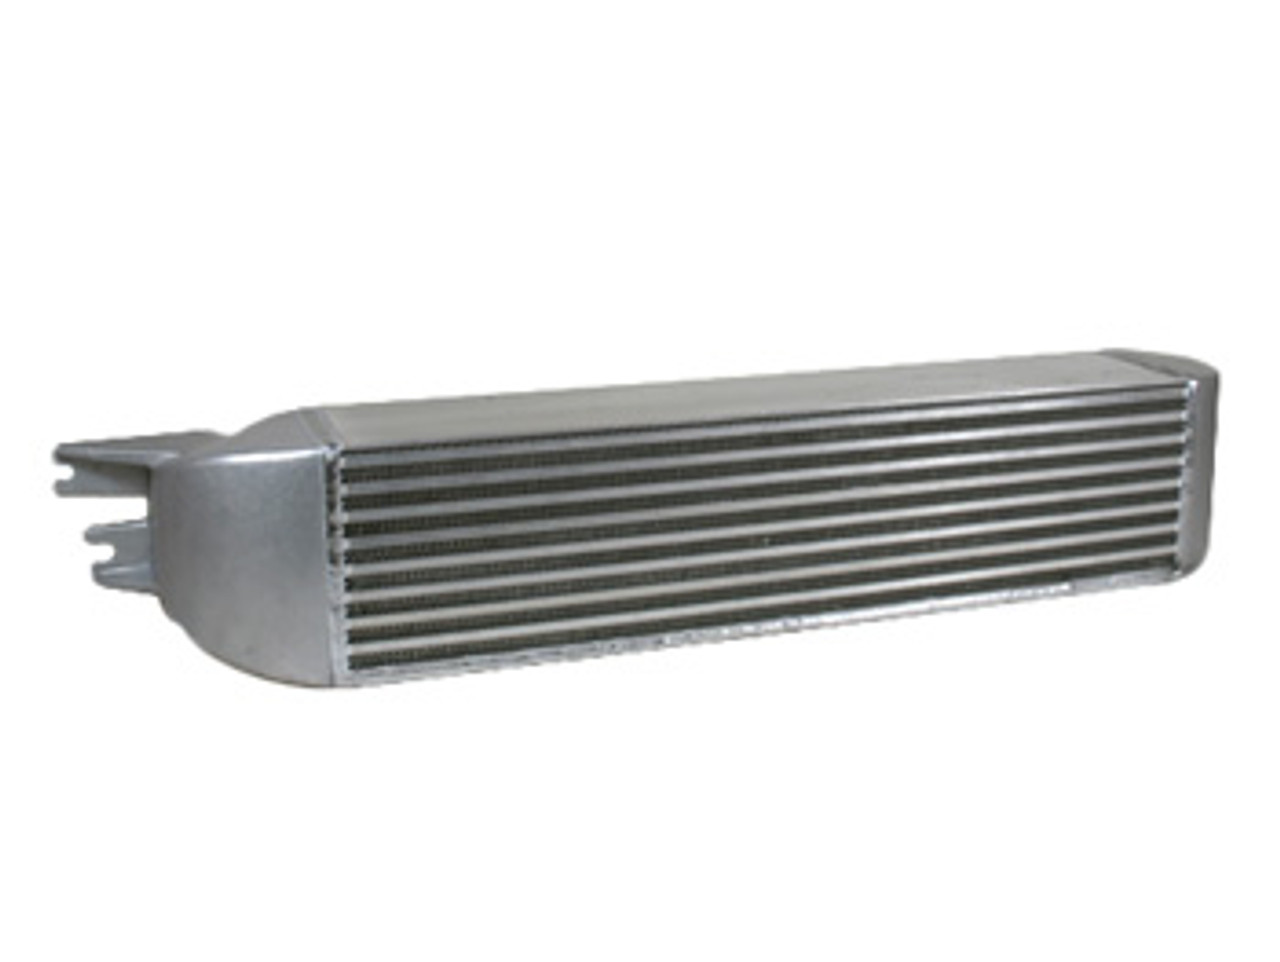 SRT-4 AGP Direct Fit Front Mount Intercooler